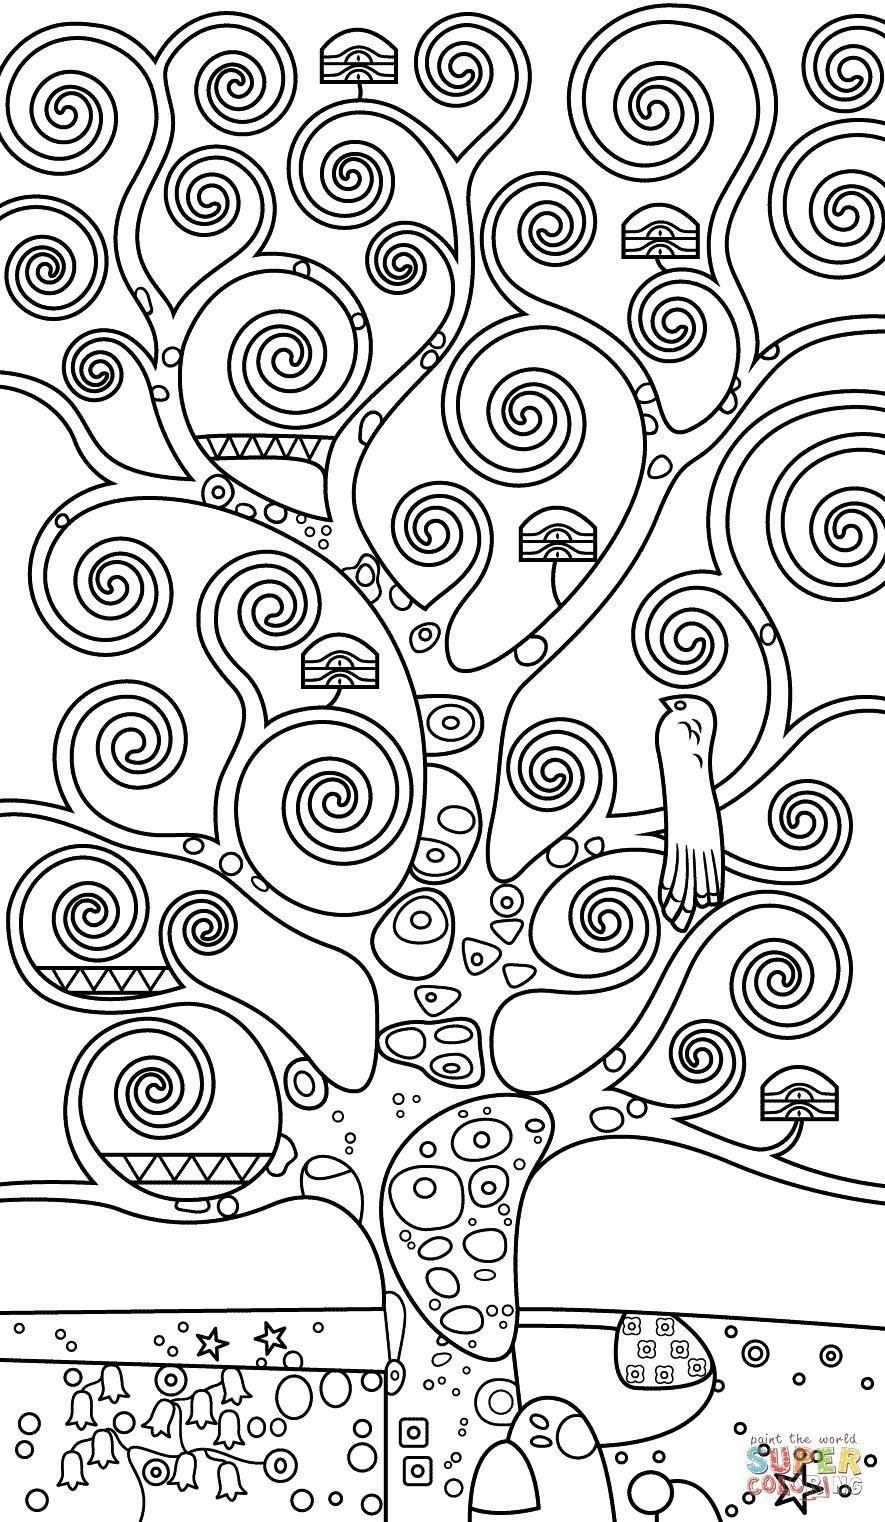 Pin de Gro Aker en Drawing | Pinterest | Imagenes para portada ...